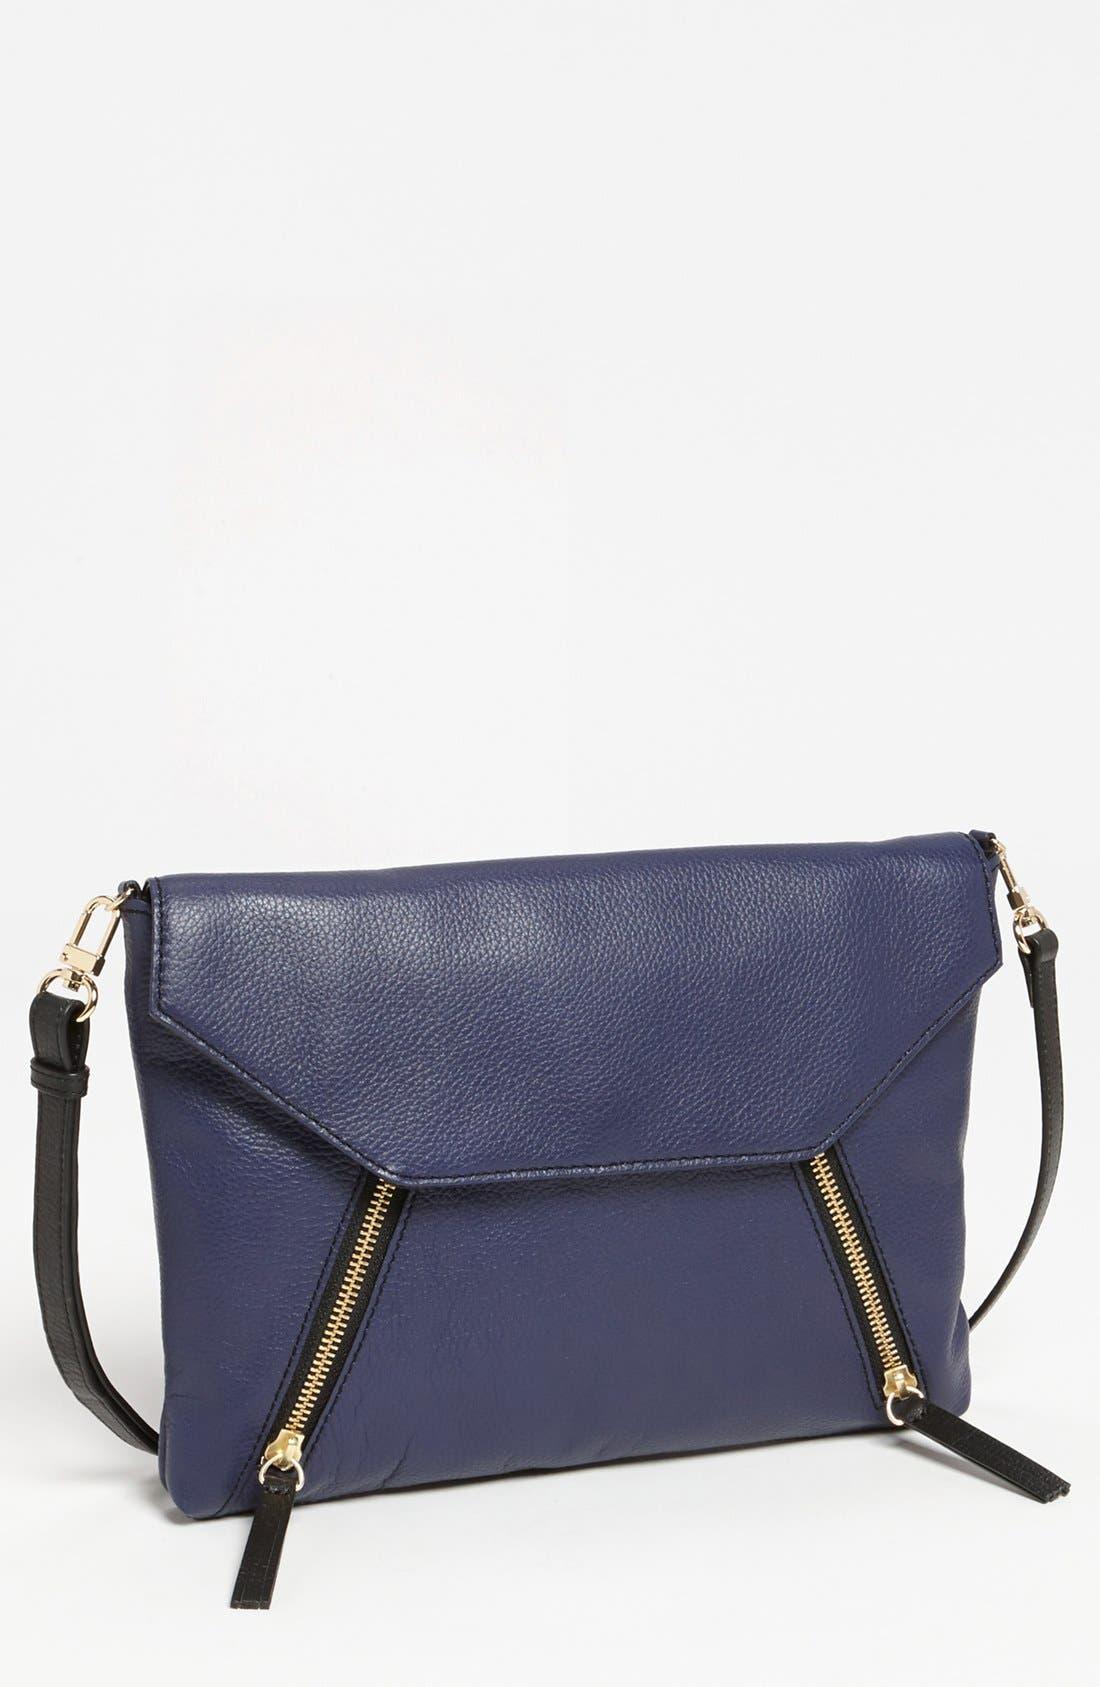 Alternate Image 1 Selected - Halogen Envelope Crossbody Bag